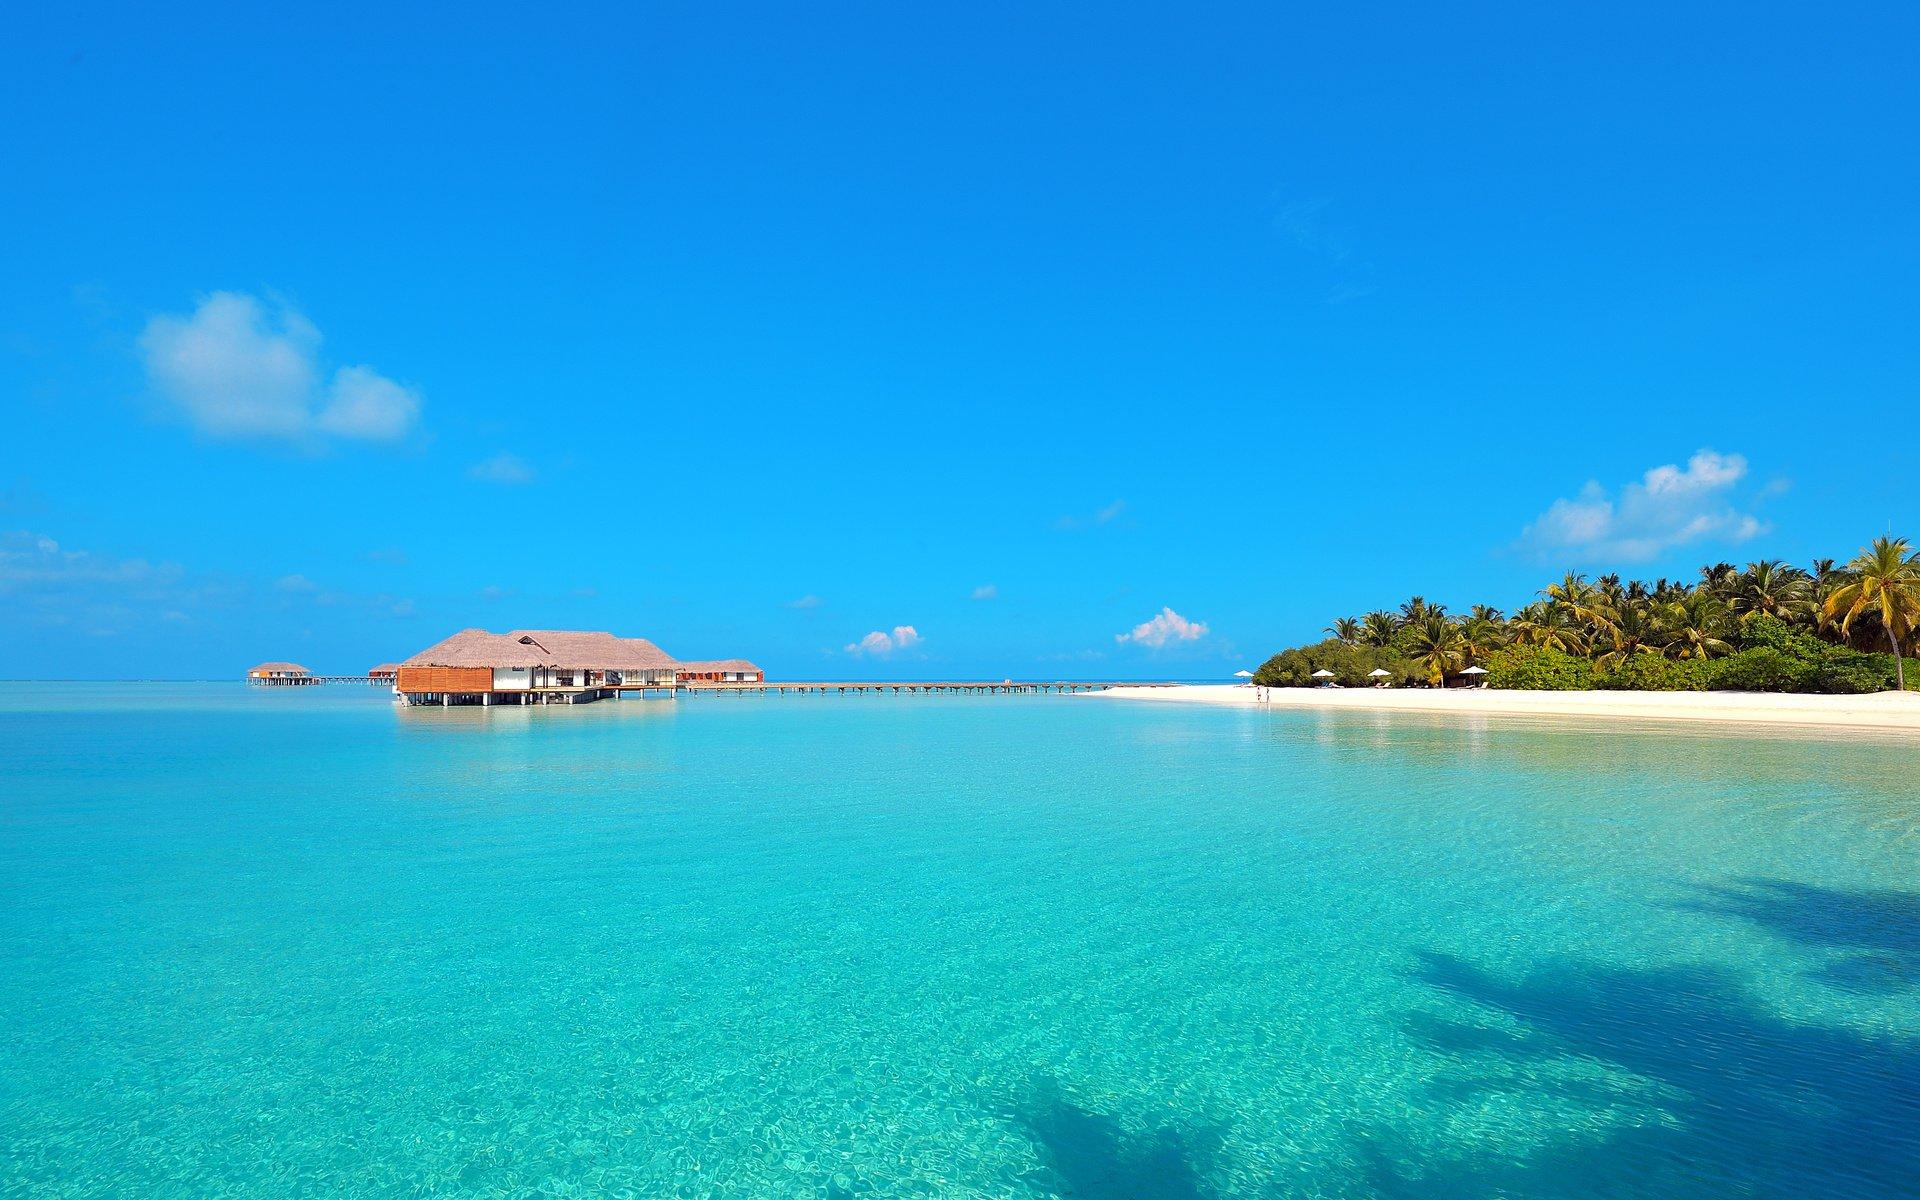 Мальдивы картинка обои